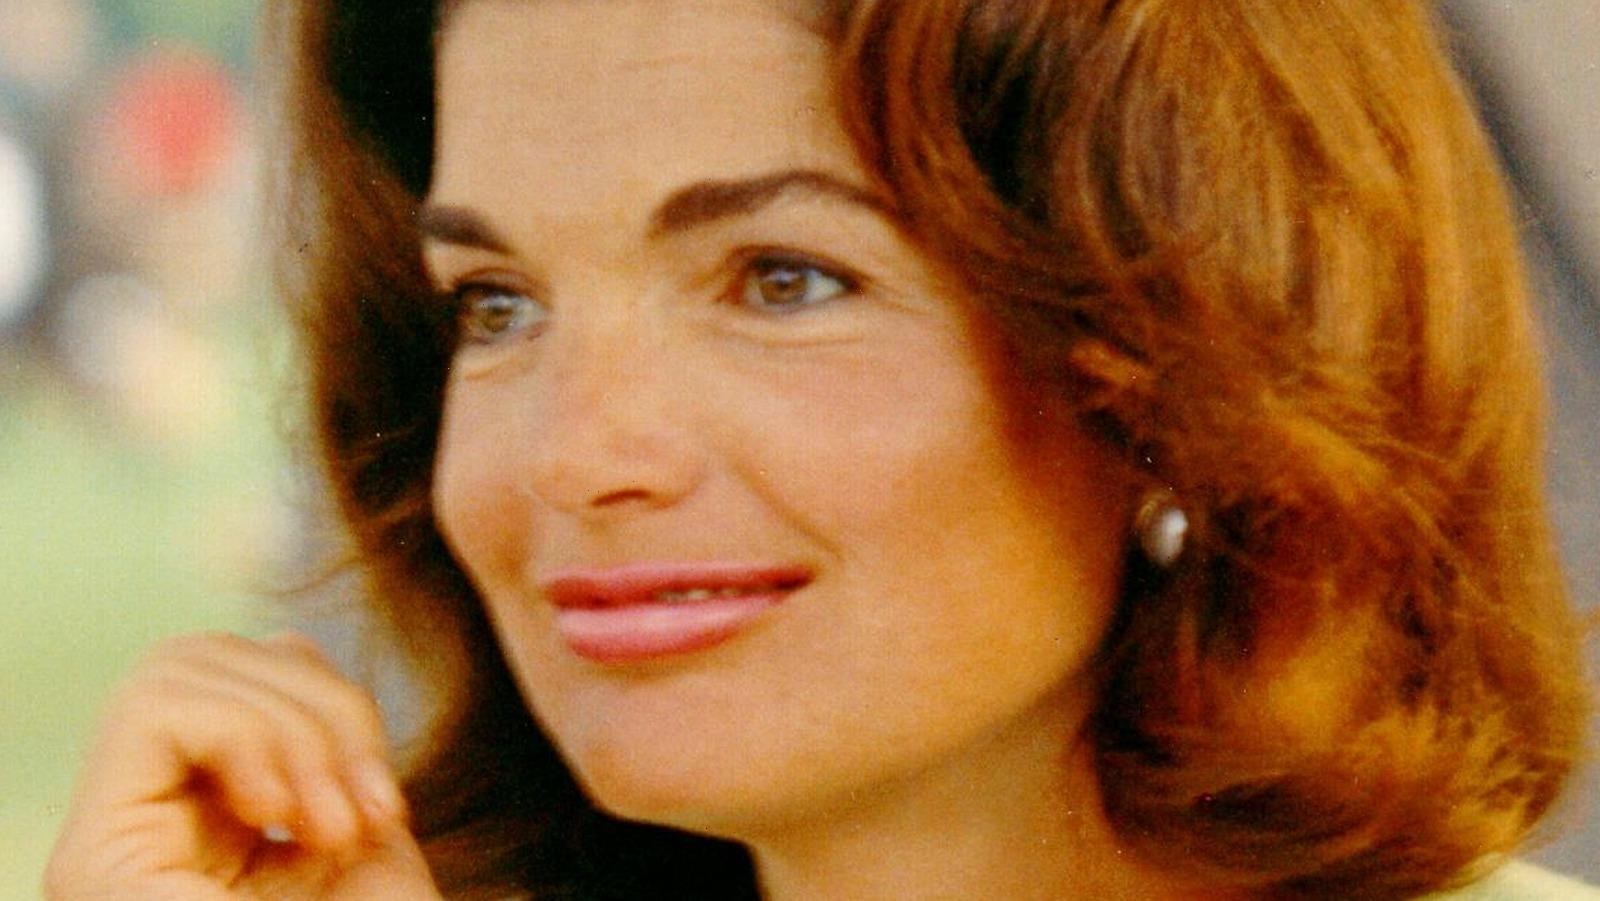 Meet The Man Jackie Kennedy Almost Married Before JFK